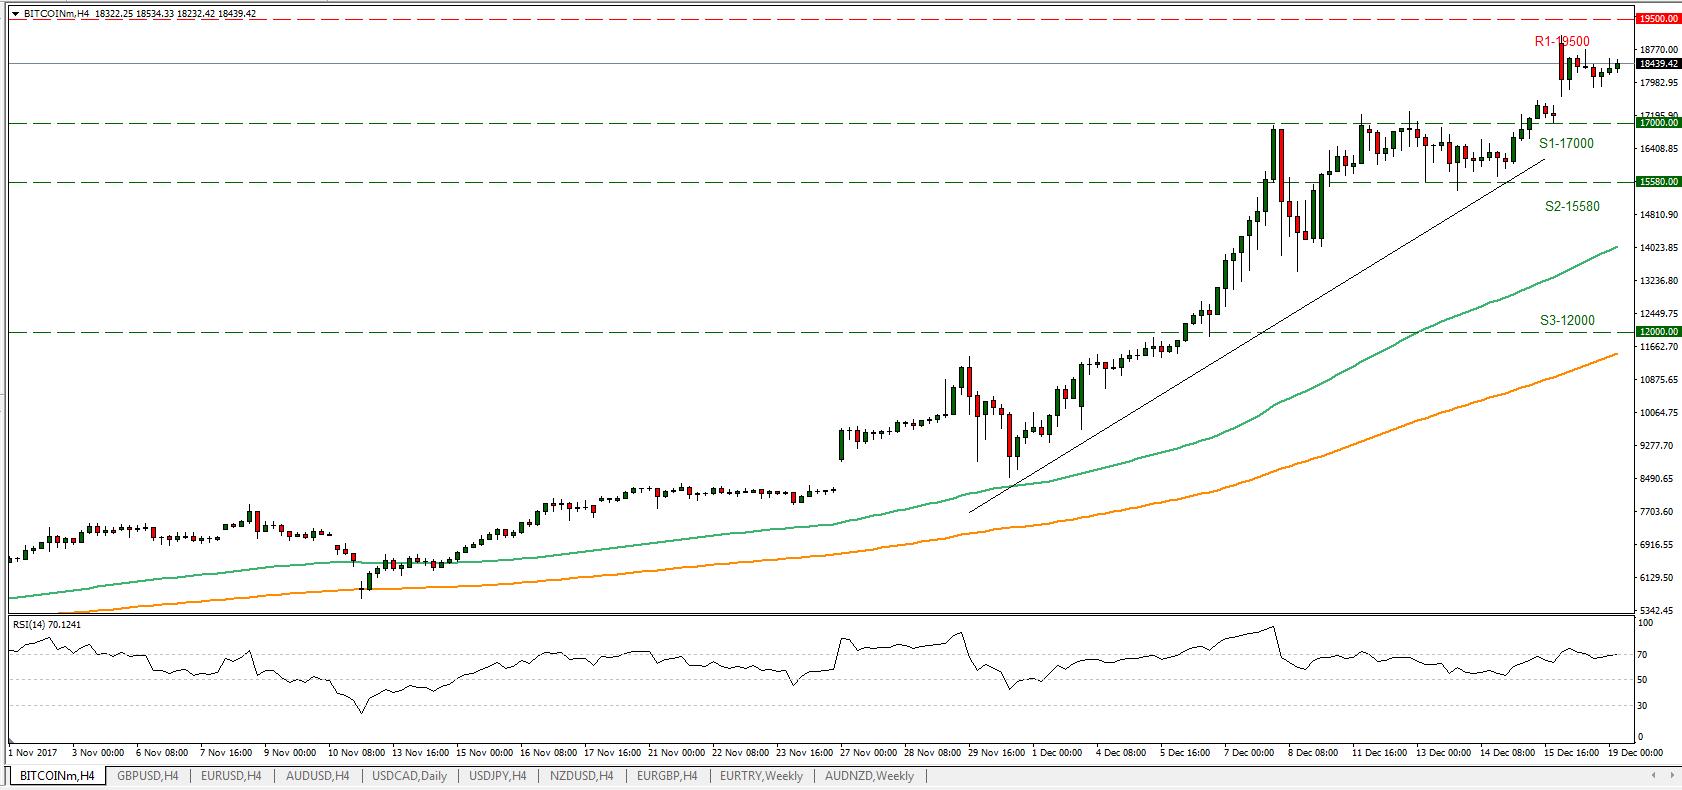 BTC/USD 19/12/2017   Econ Alerts